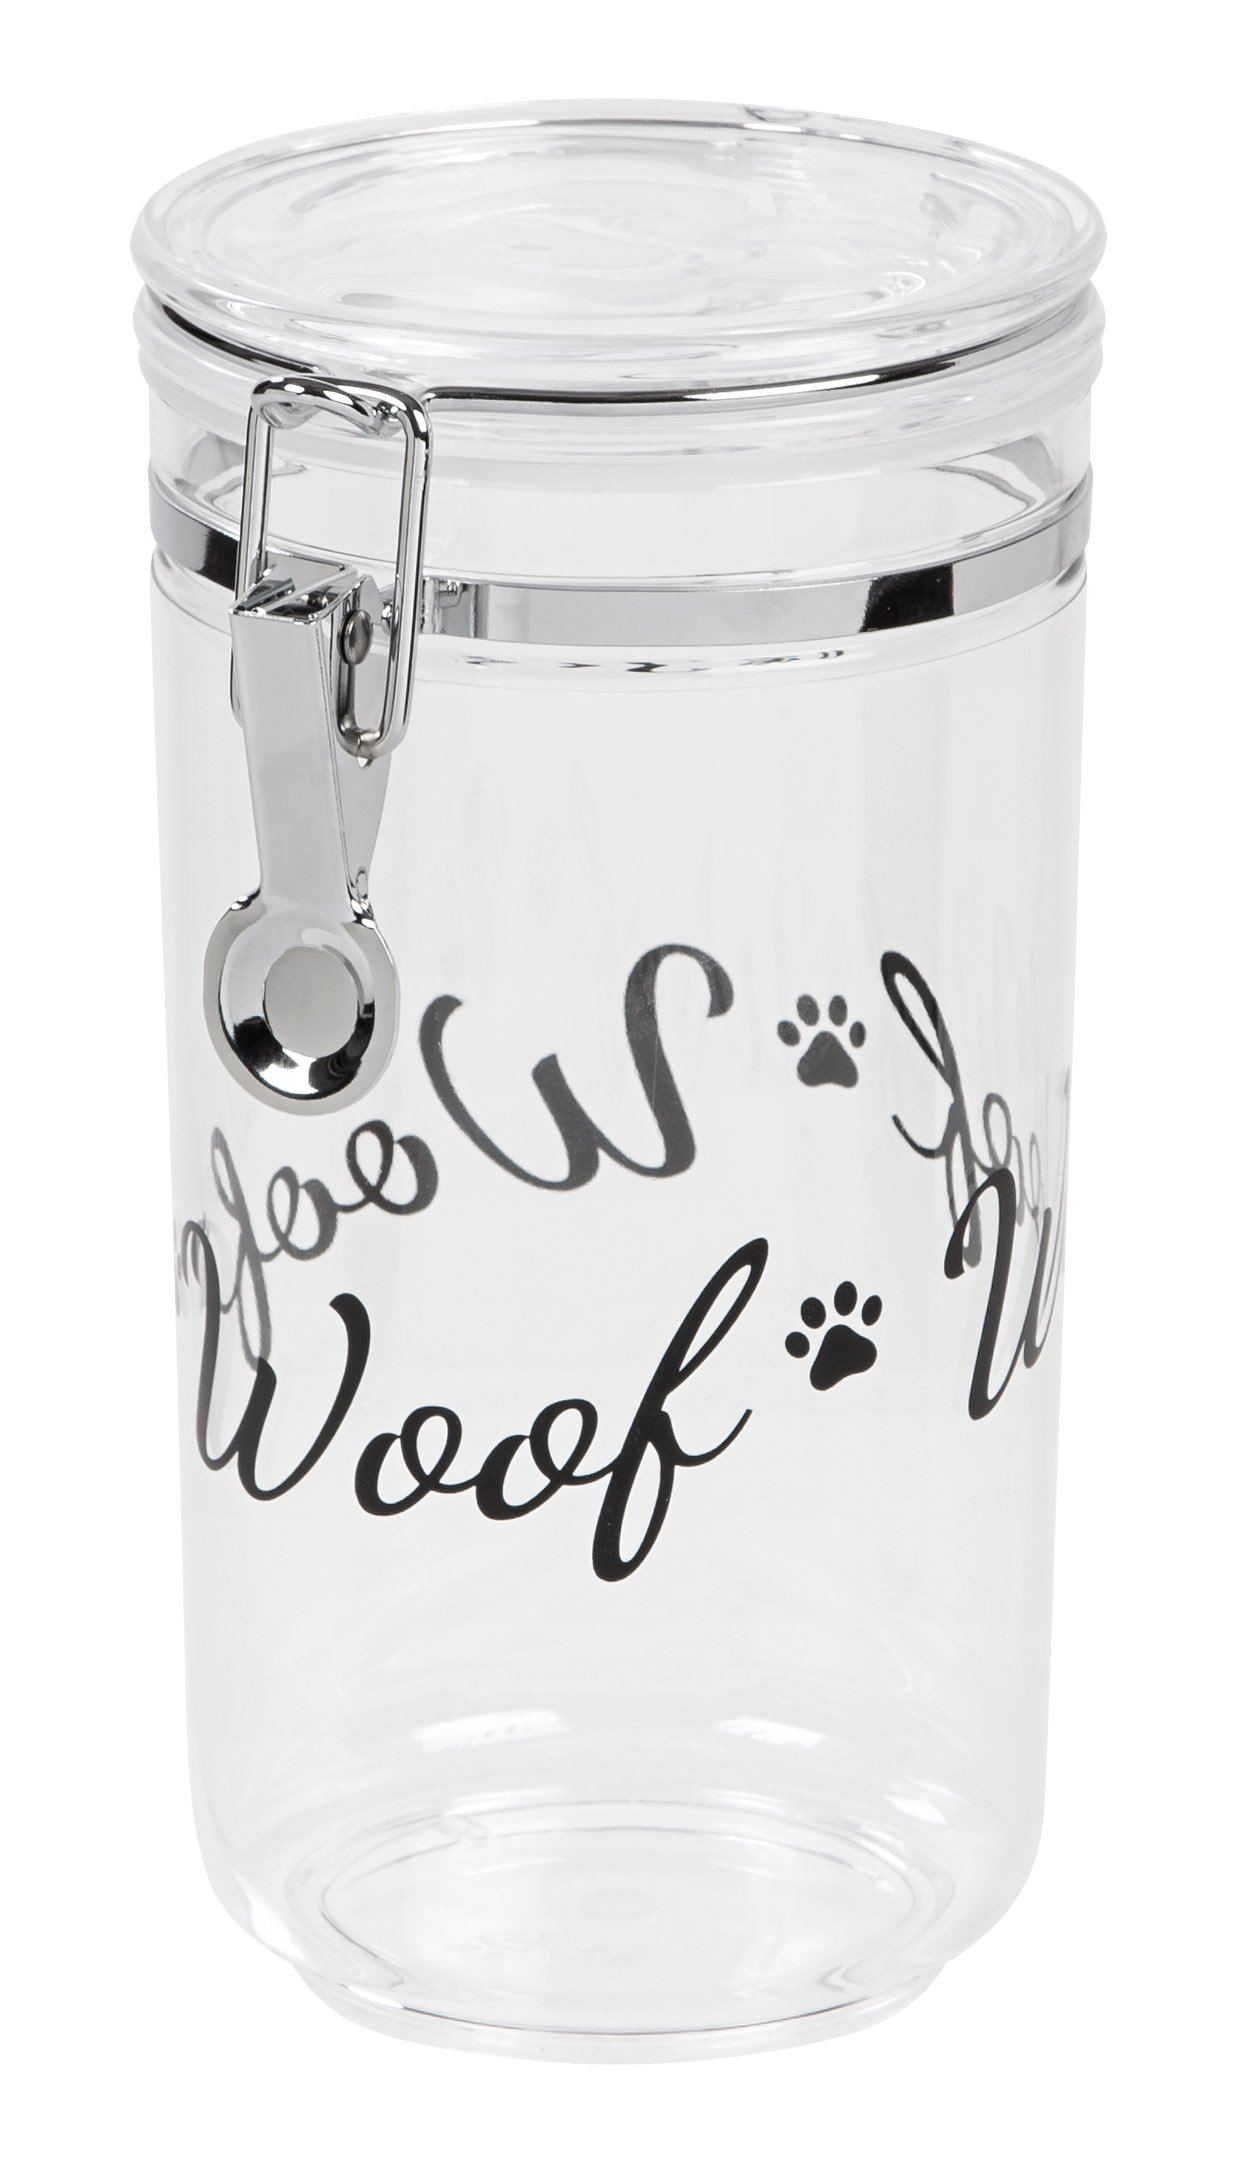 IRIS Acrylic Meow treat Jar Black Woof